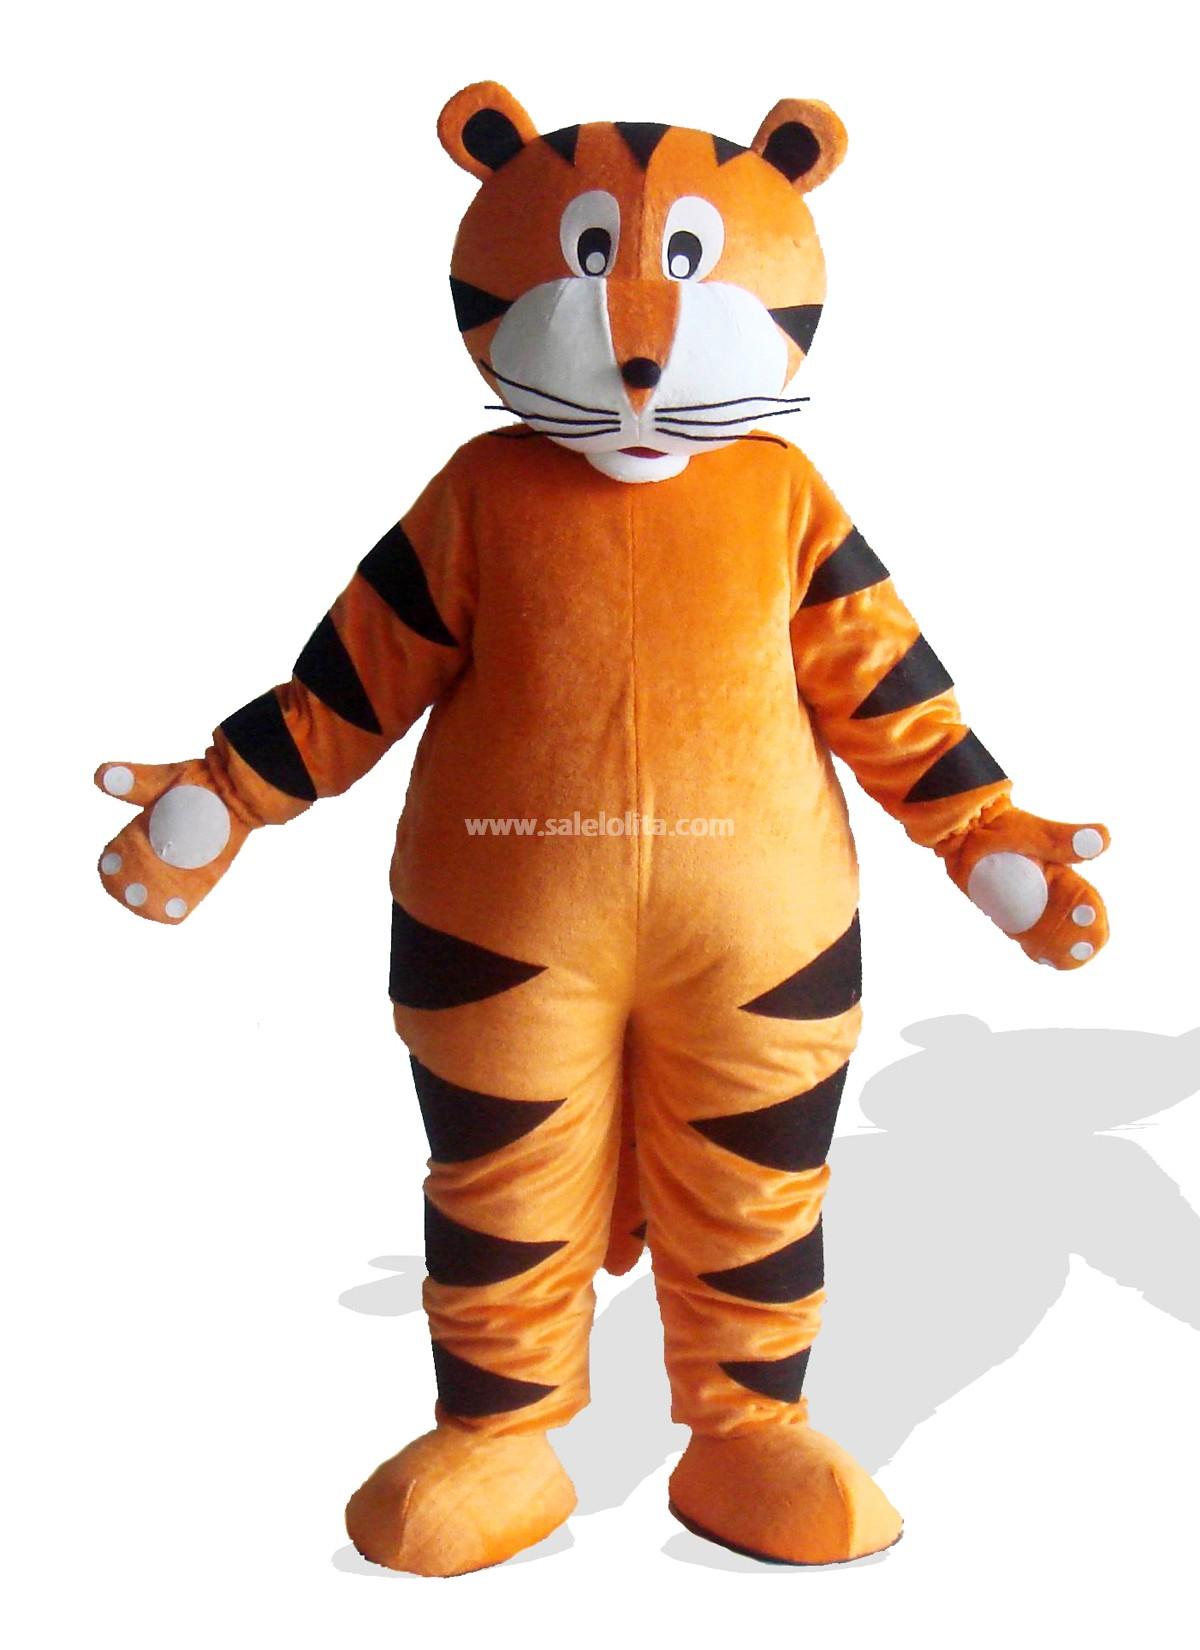 Tiger With White Claw Plush Adult Mascot Costume - SaleLoLita.com